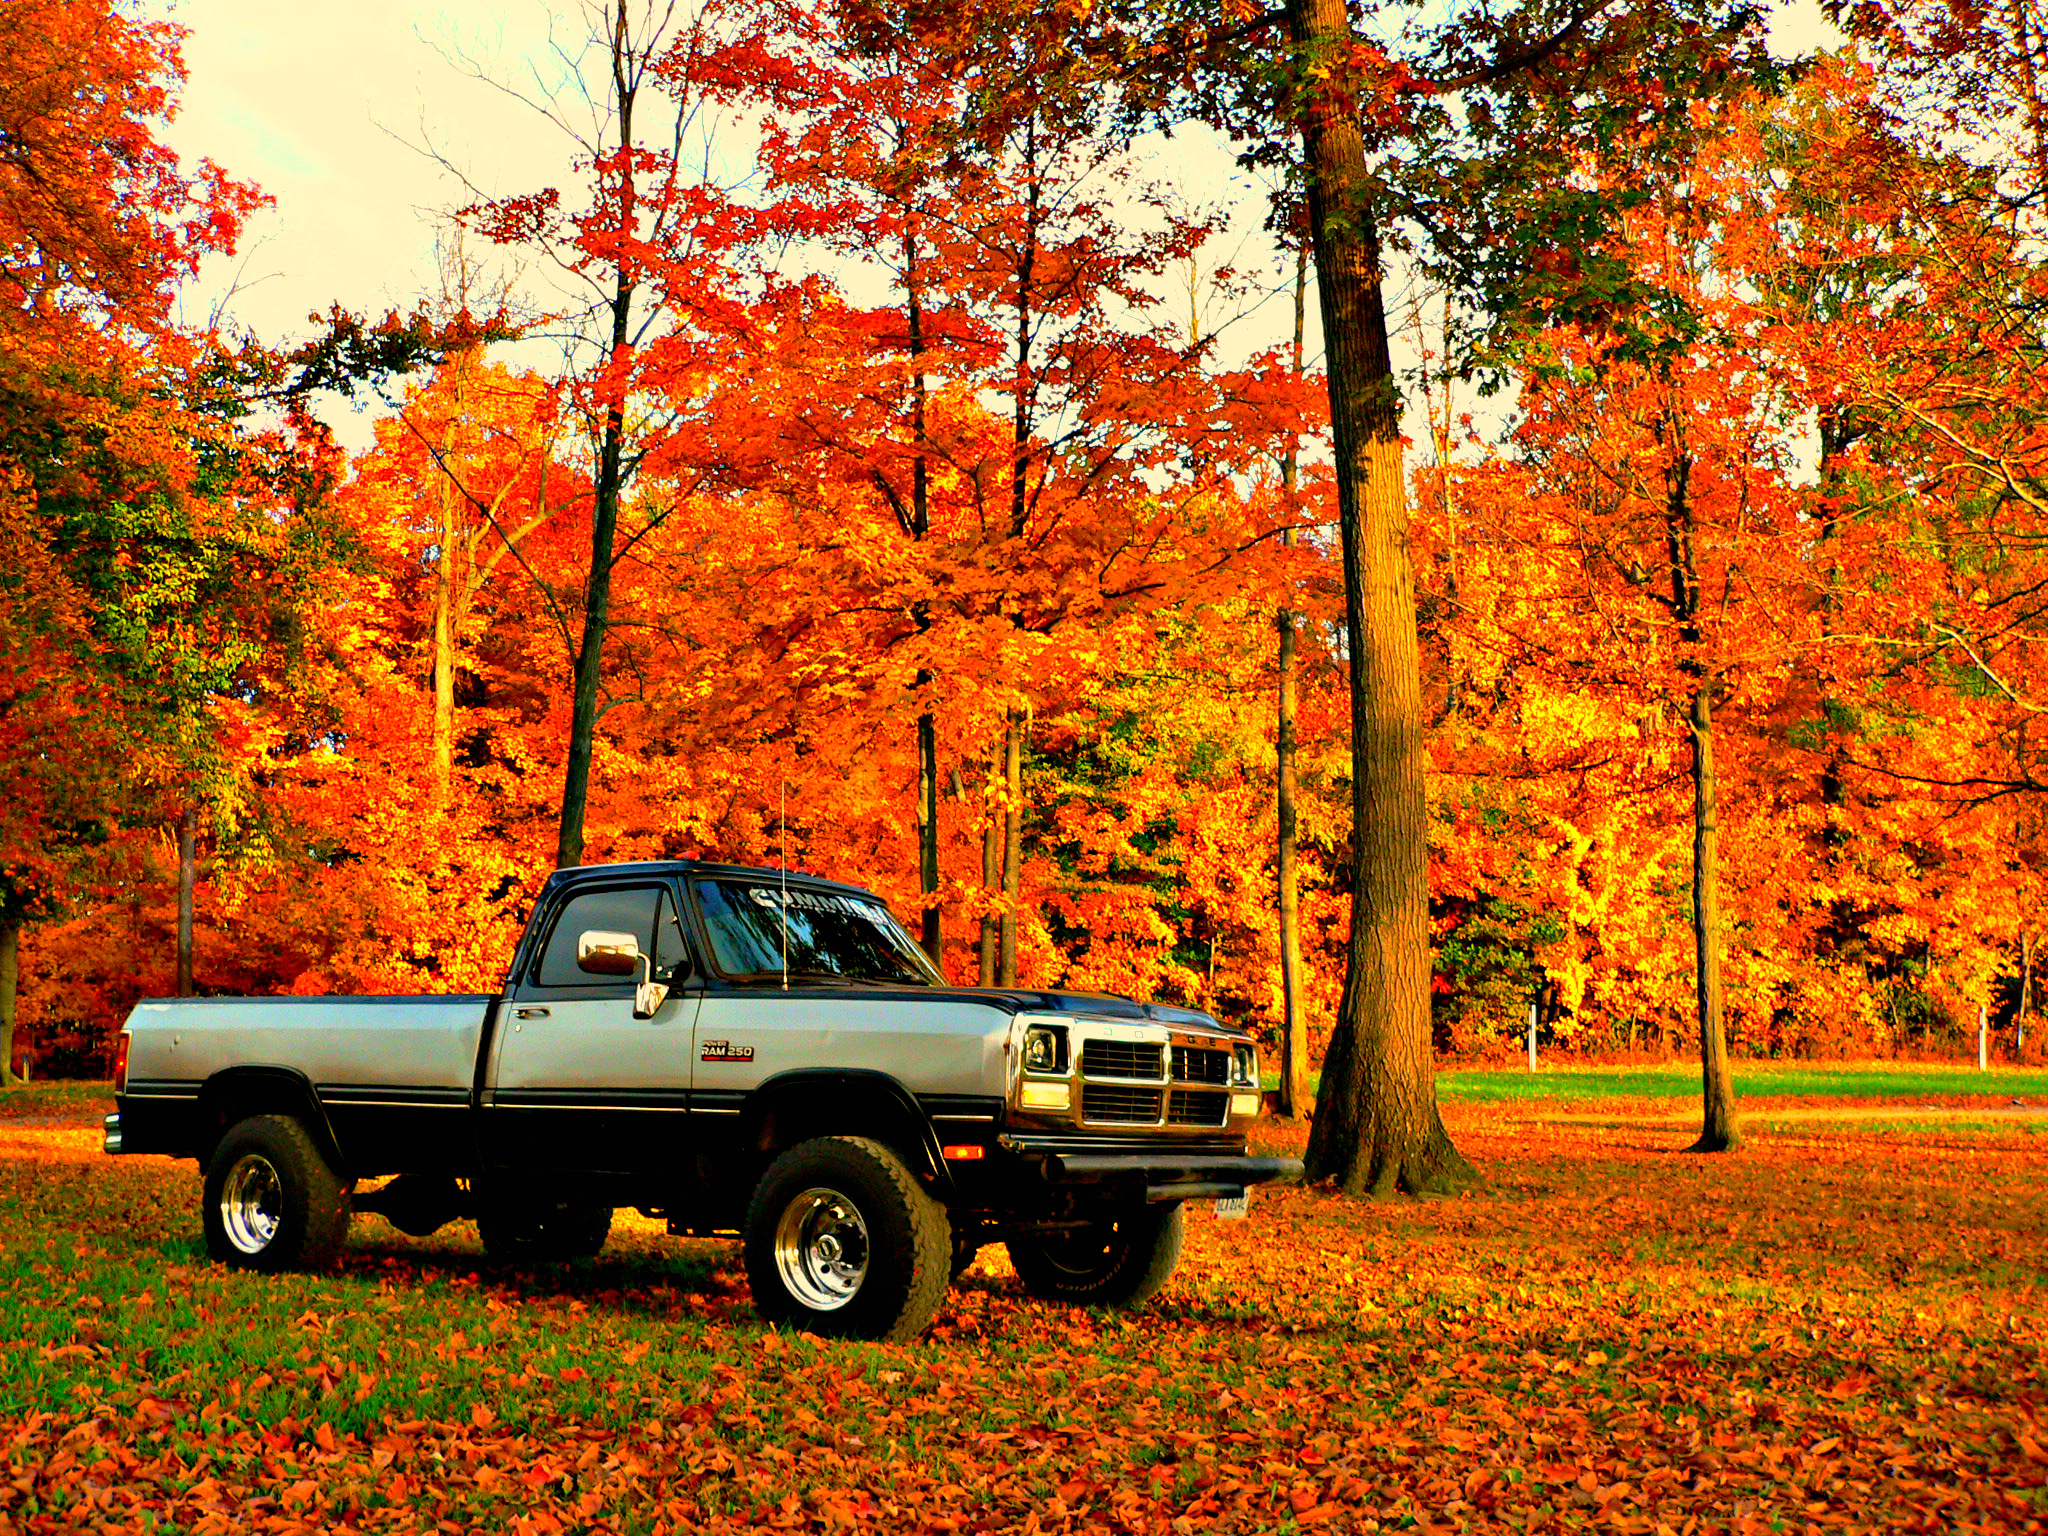 1991 5 Dodge W250 Cummins On A Fall Day In Ohio Dodge Cummins Diesel Dodge Cummins Cummins